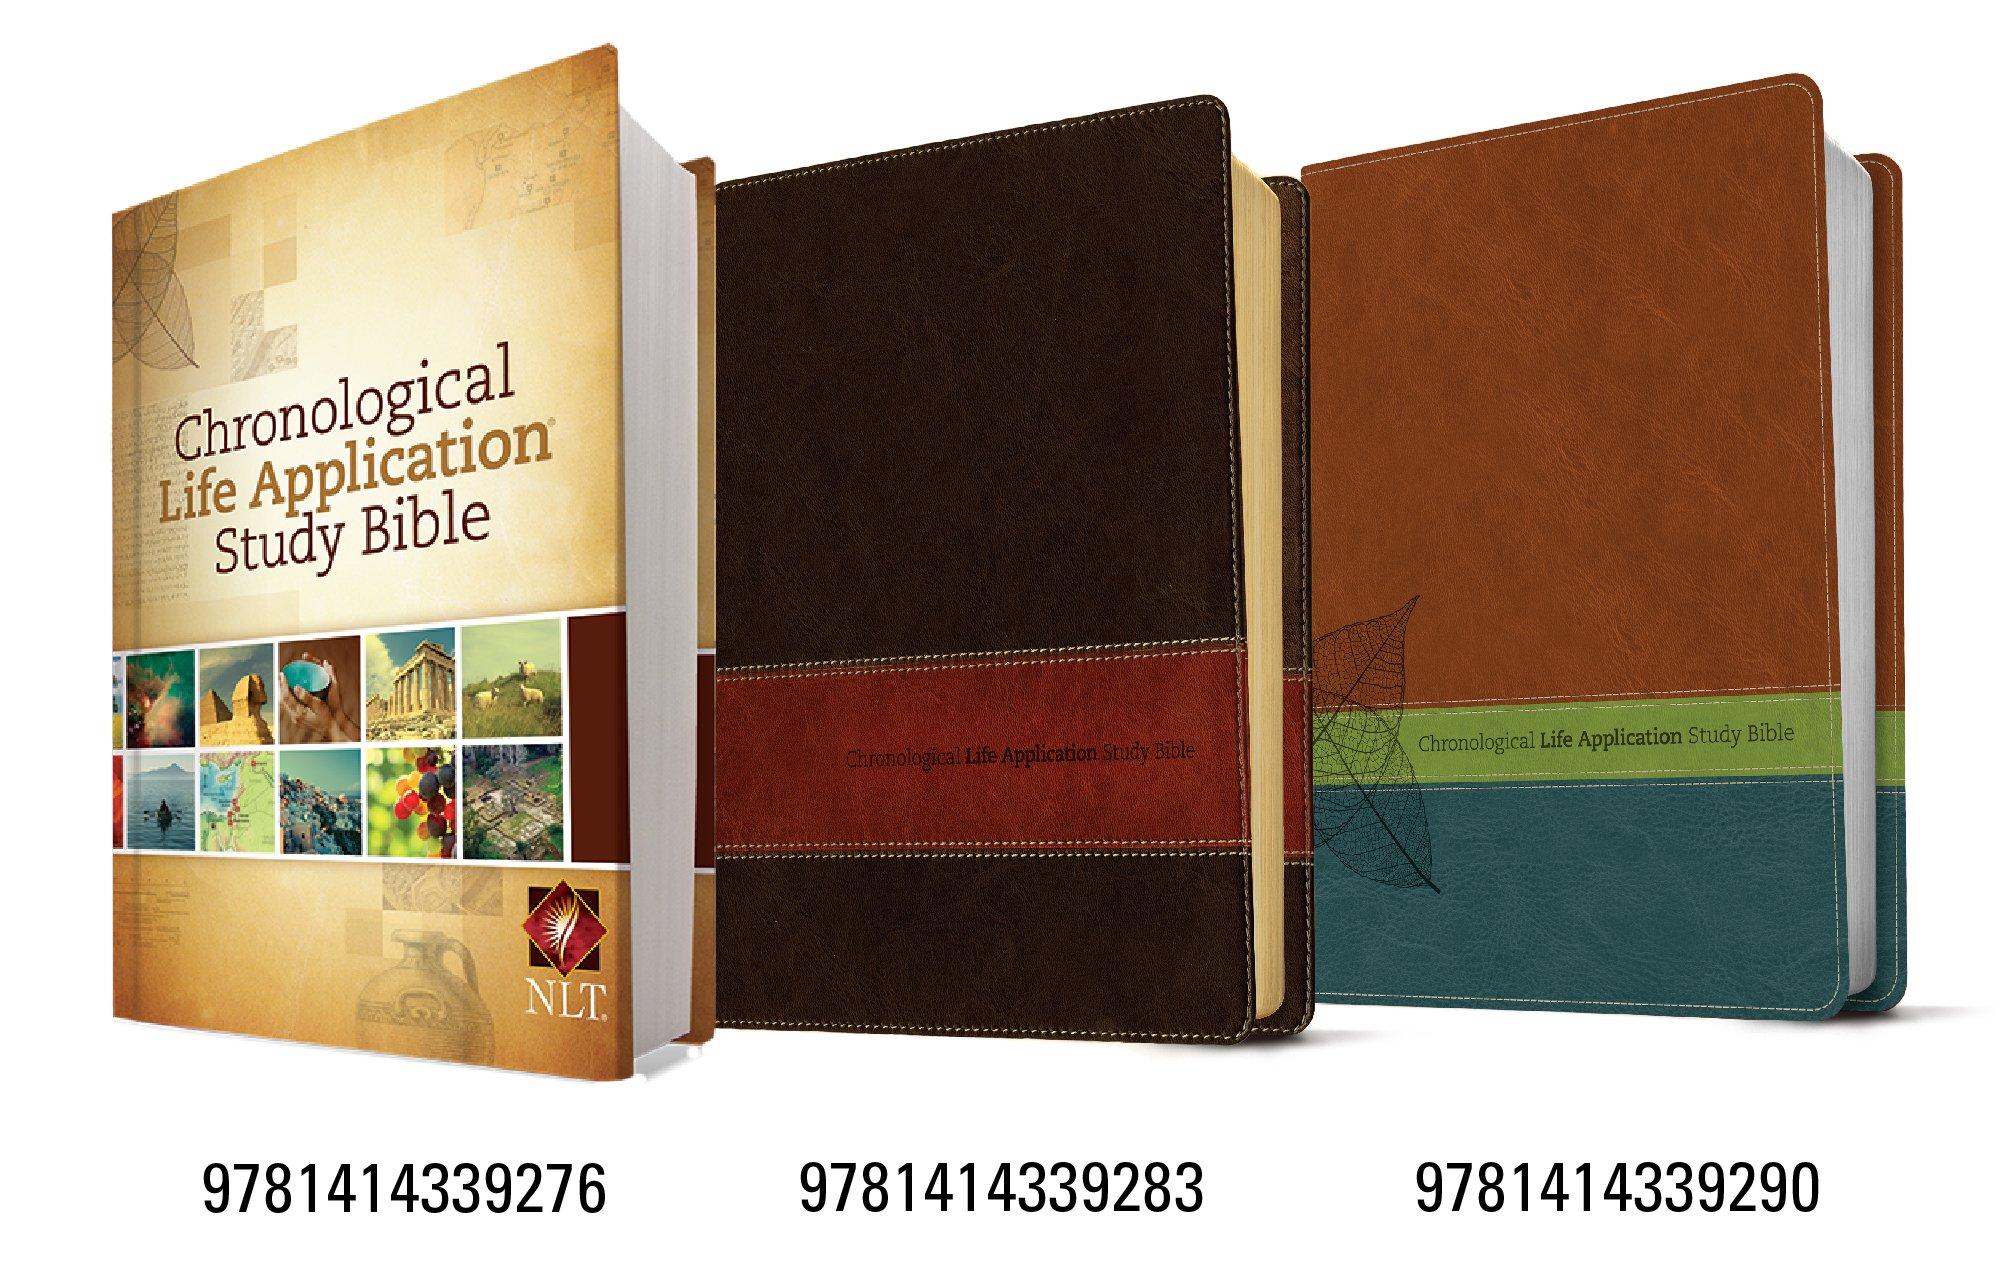 Chronological Life Application Study Bible NLT: Tyndale: 9781414339276:  Amazon.com: Books